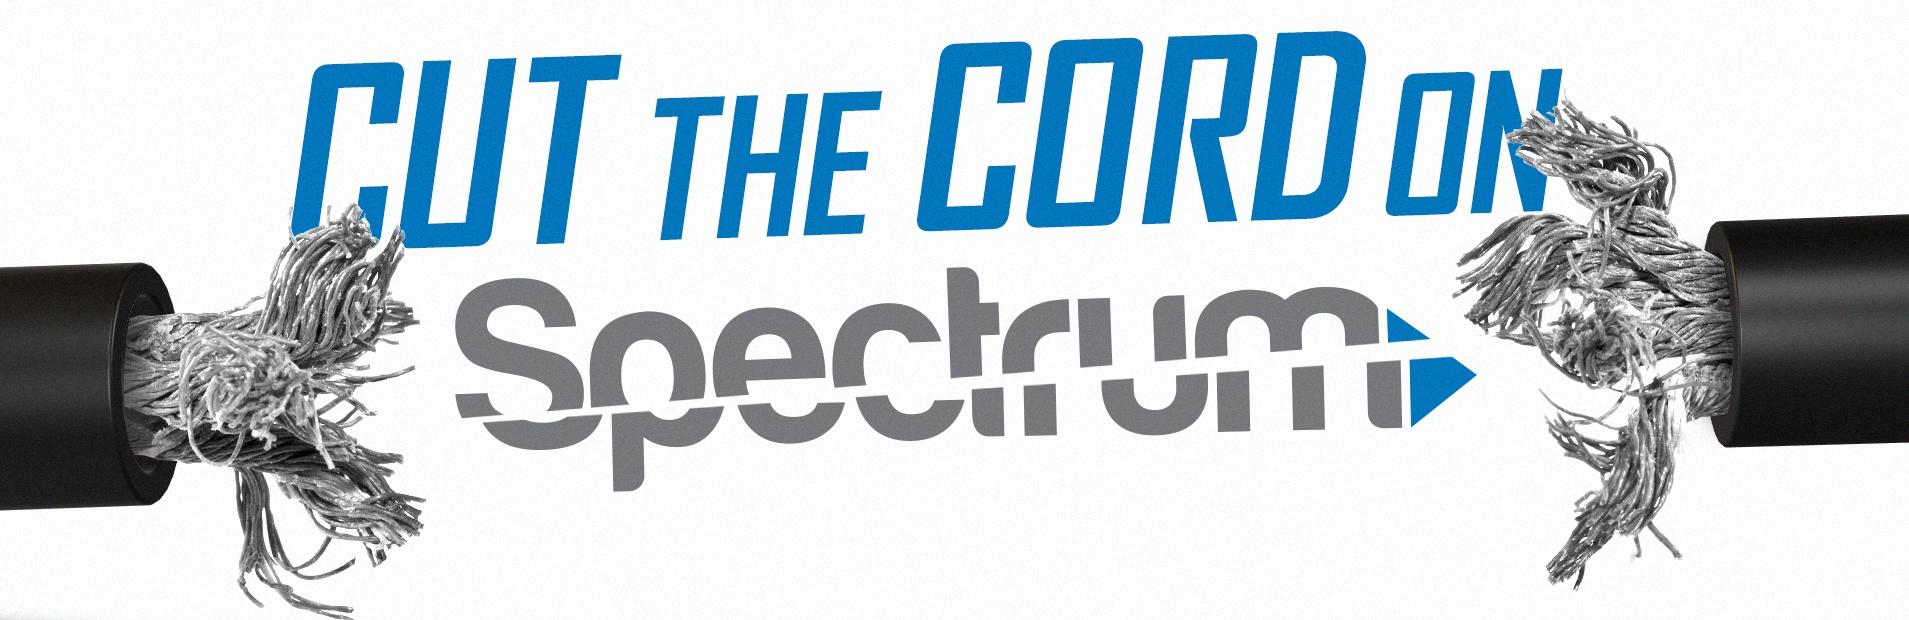 Spectrum_Strike_CutTheCord_v10.jpg